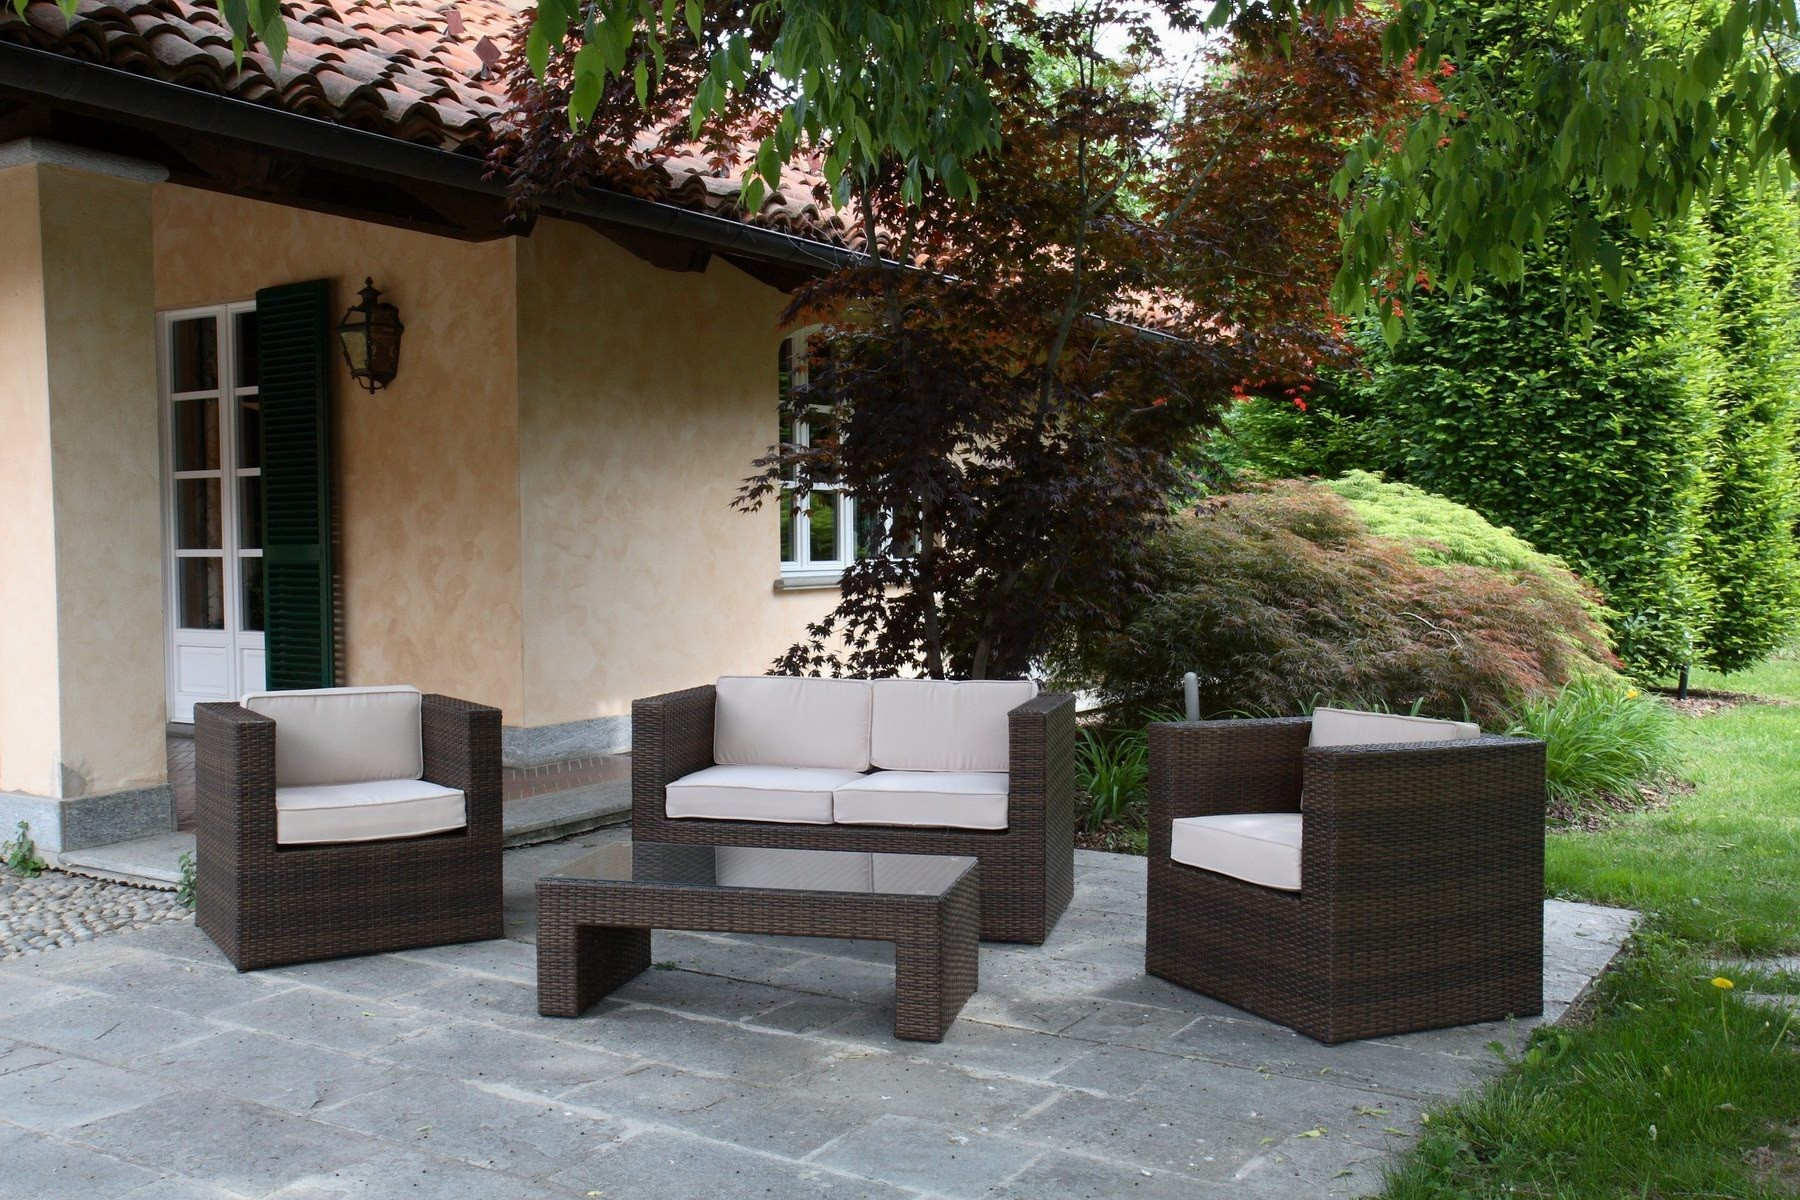 mobili da giardino economici nuovi e usati offerte ikea